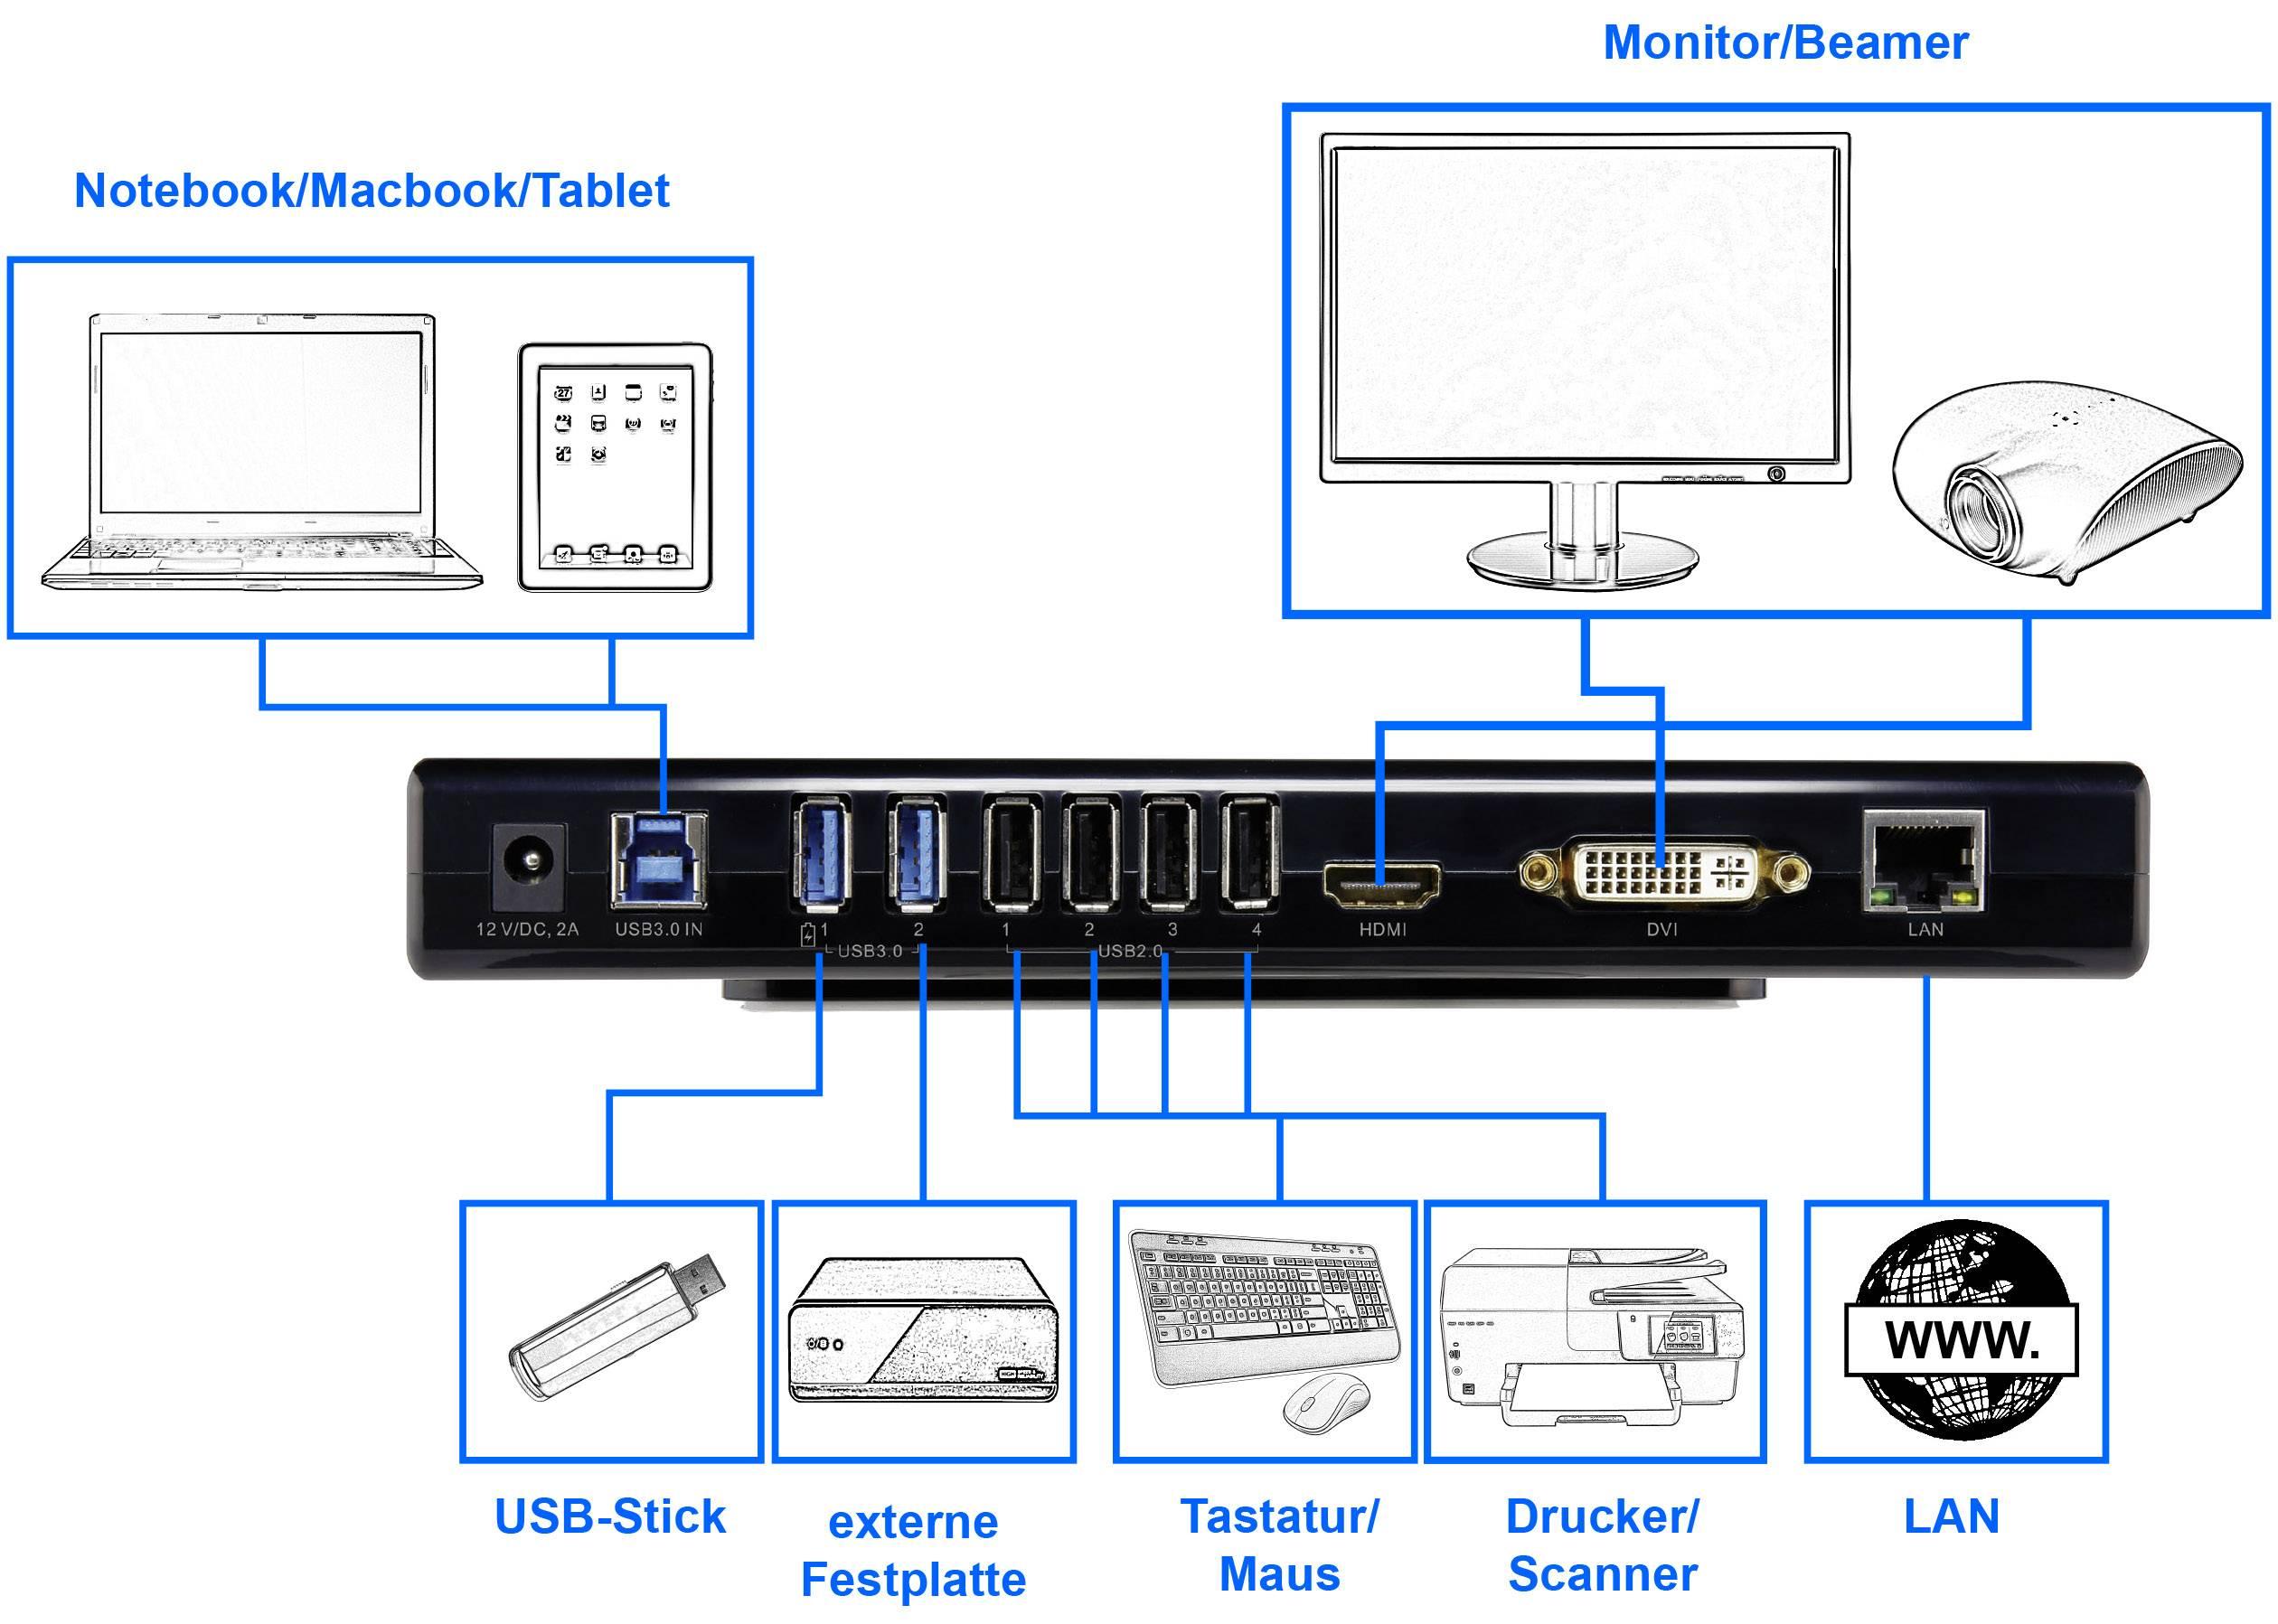 hight resolution of renkforcelaptop docking stationuniversal 2x usb 3 0 4x usb 2 0 1x hdmi headphones 1x dvi 1x lan 10 100 1000 mbps